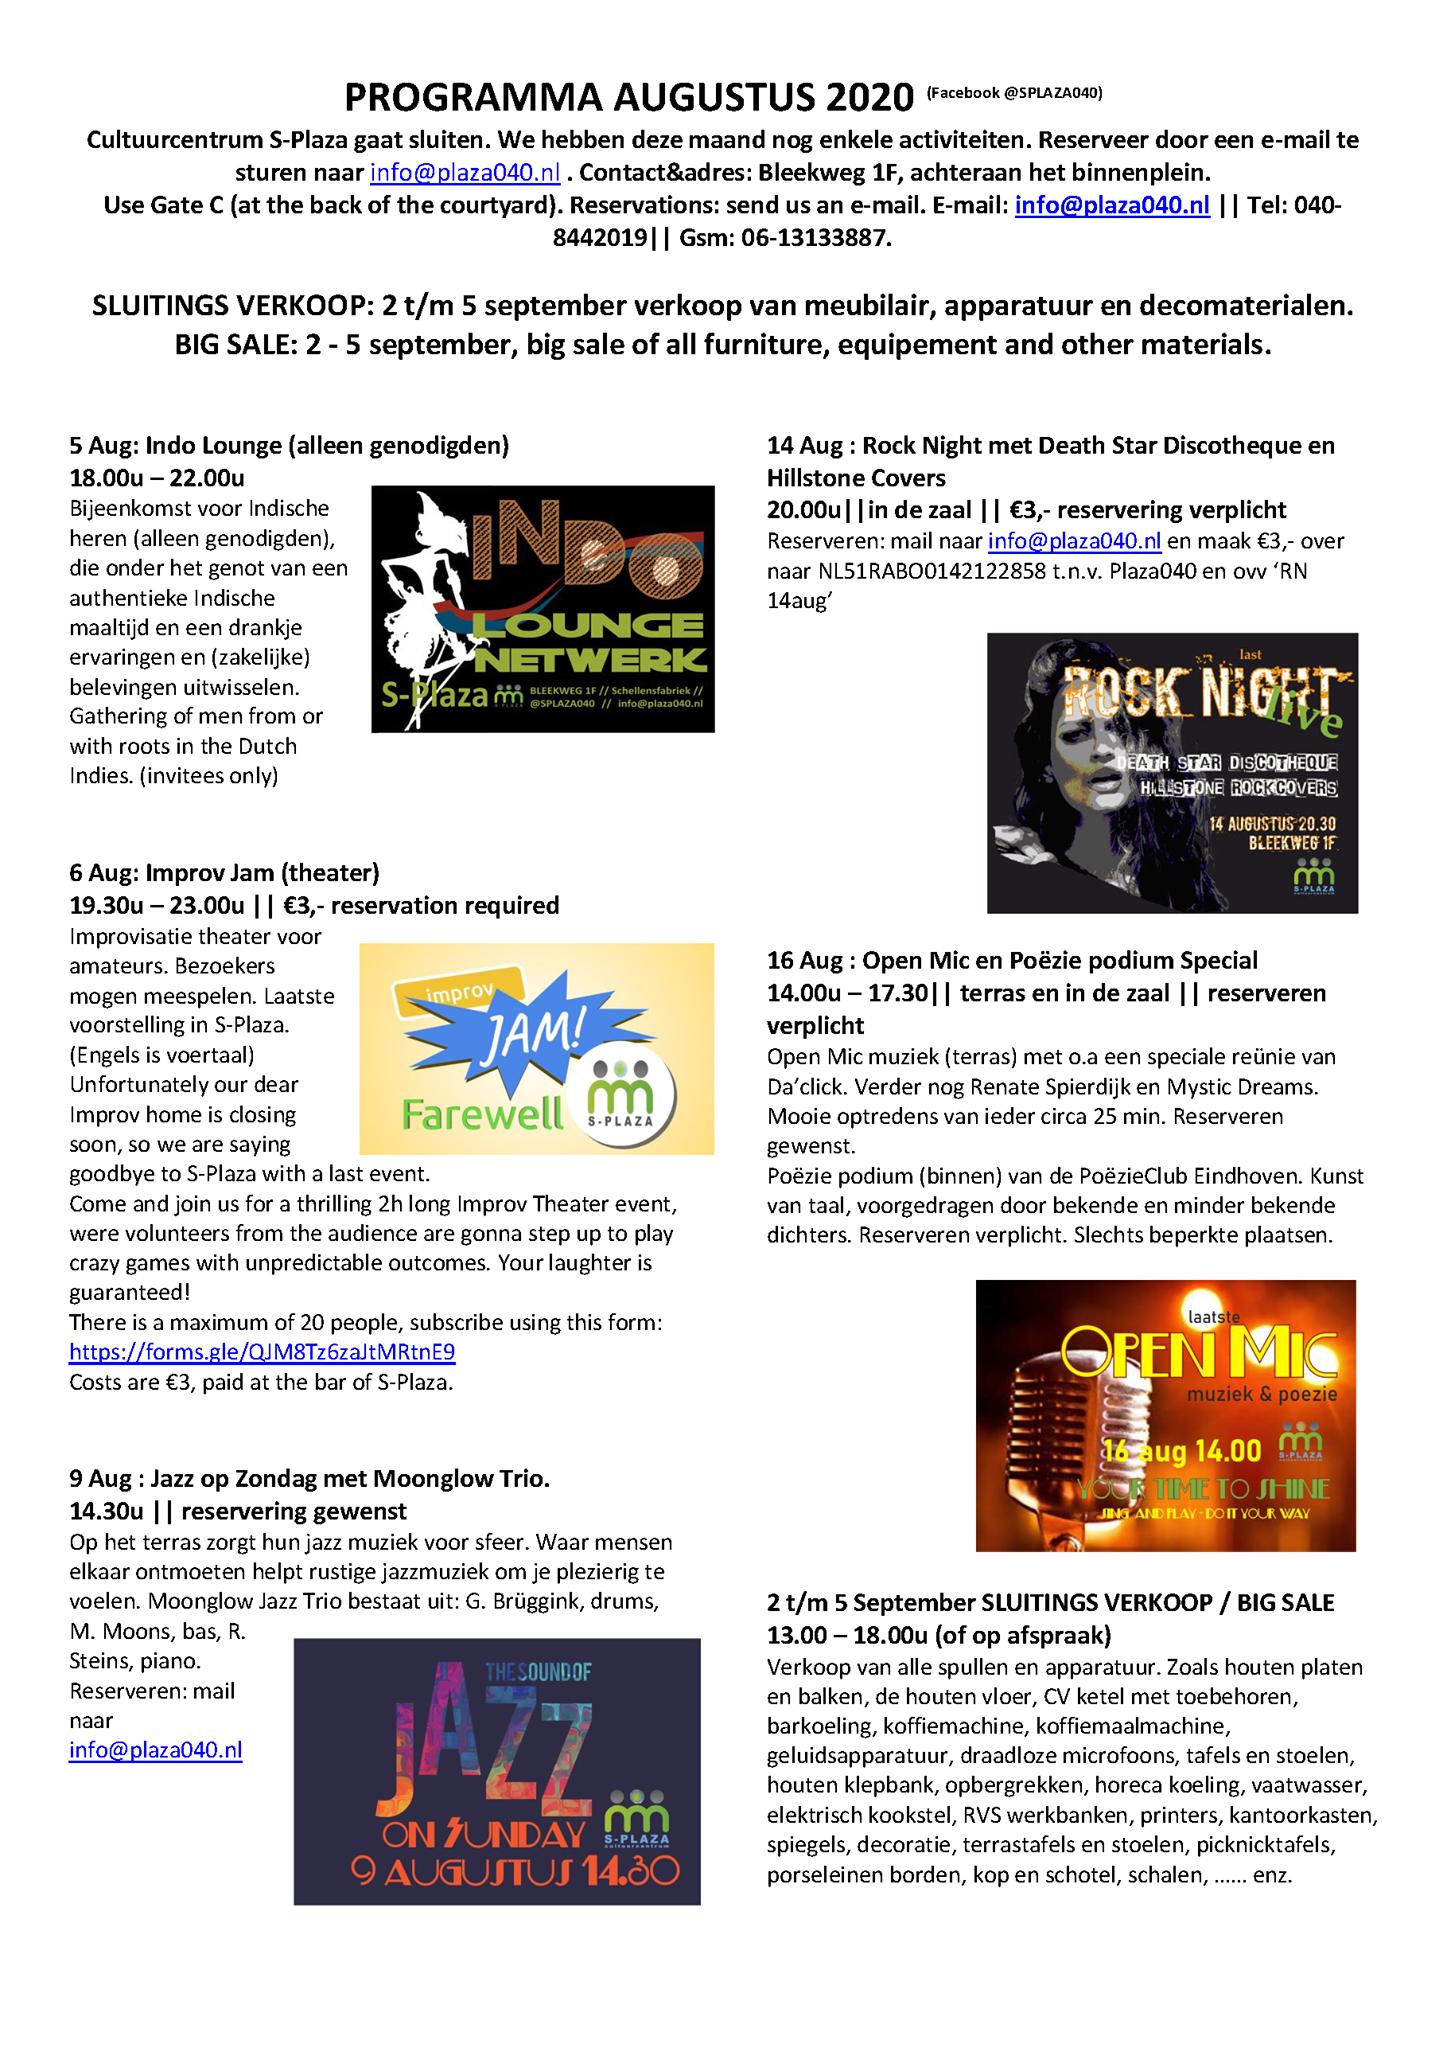 200803 Programma S-Plaza augustus 2020